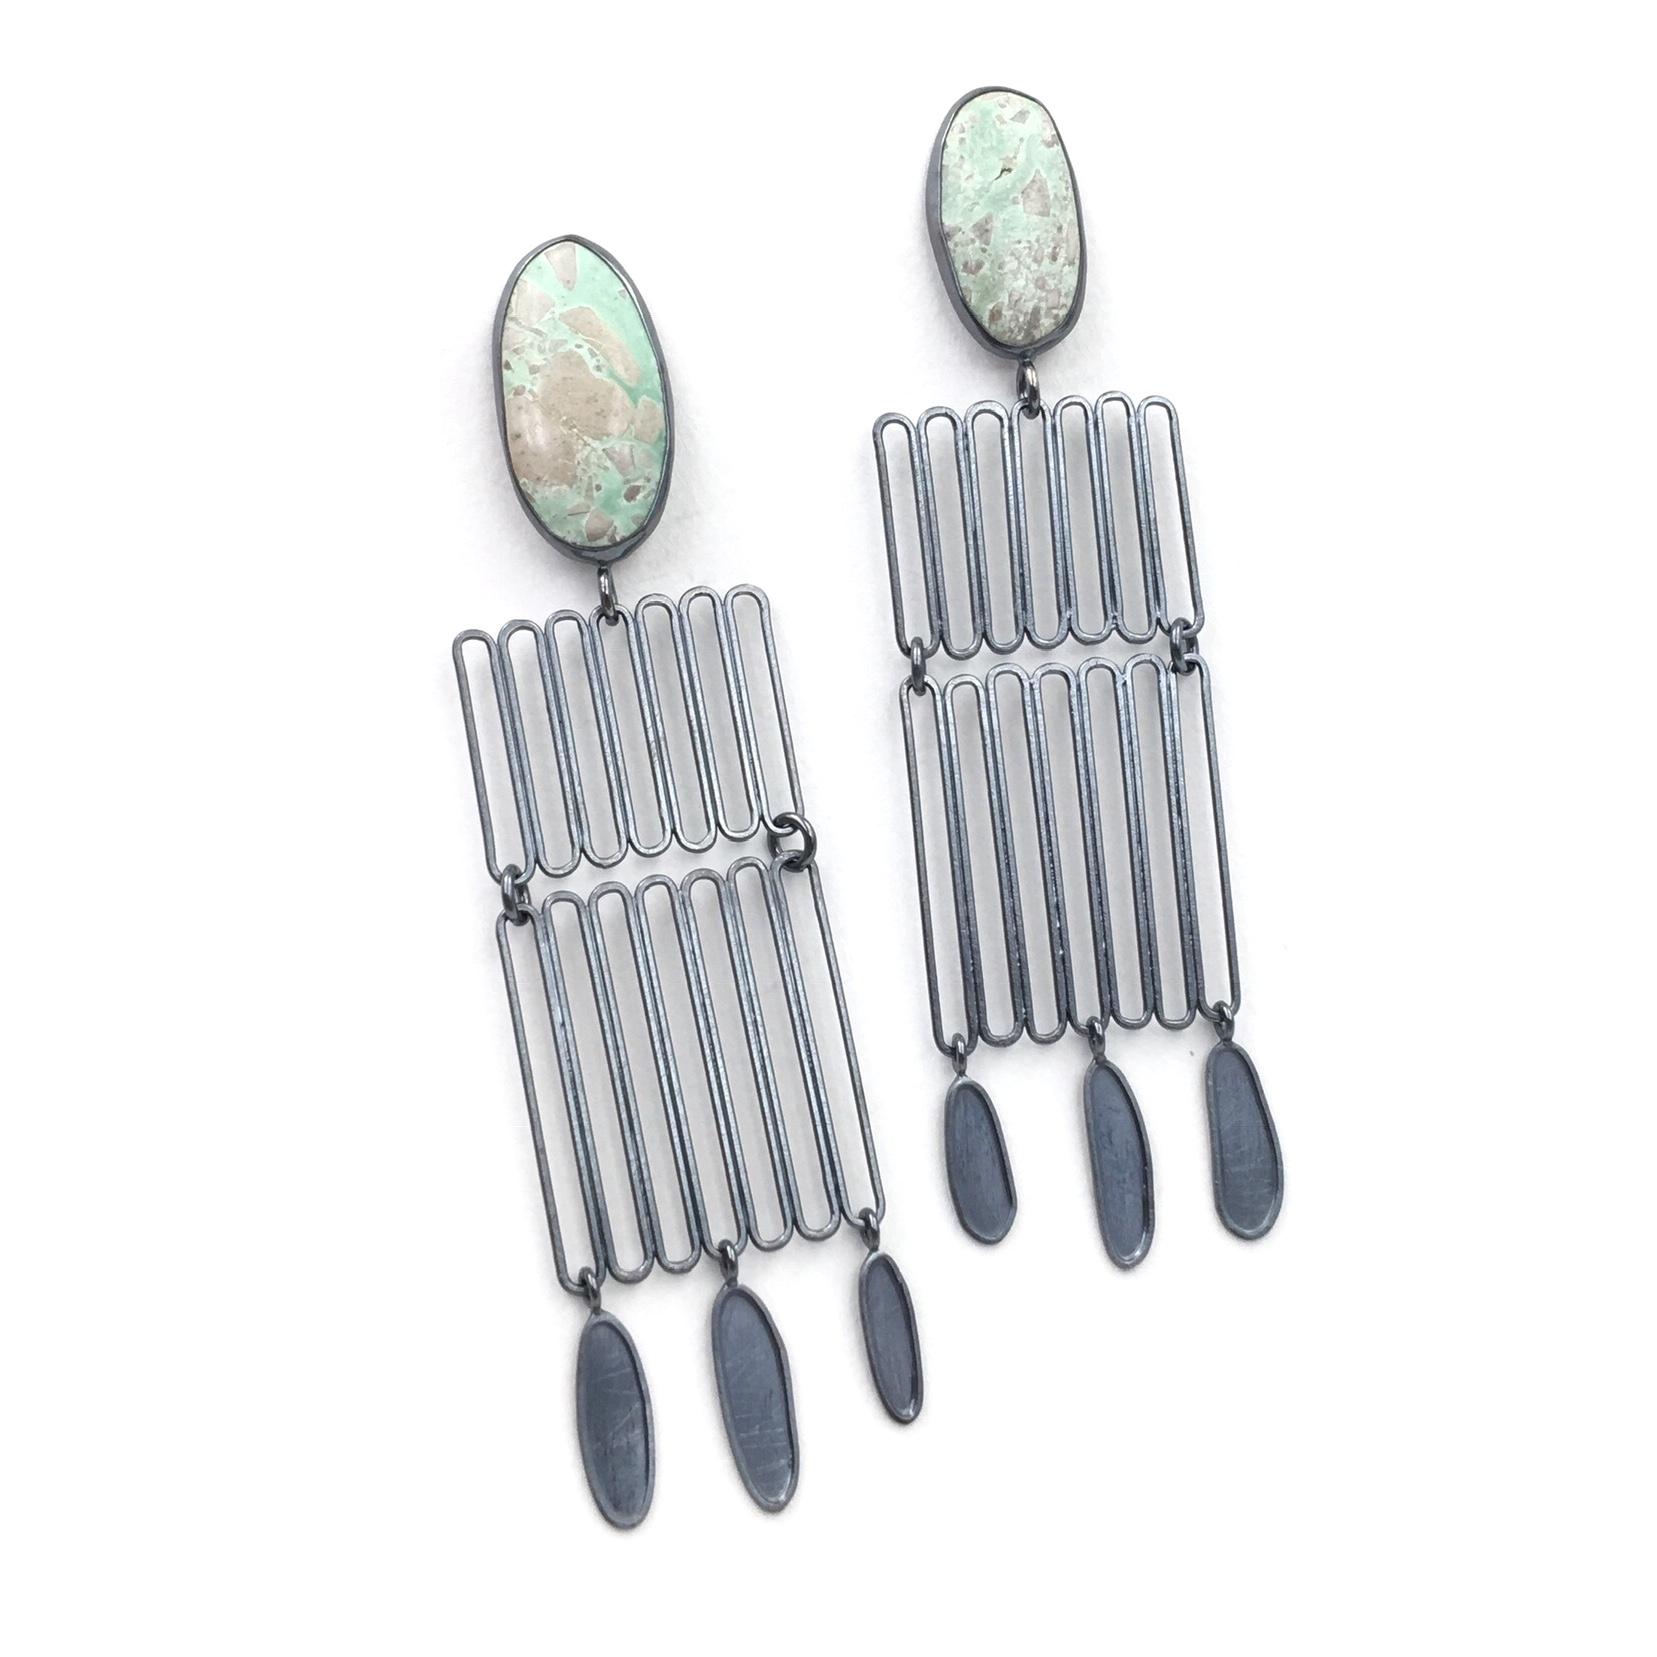 VARISCITE STACK EARRINGS  Oxidized sterling silver, variscite